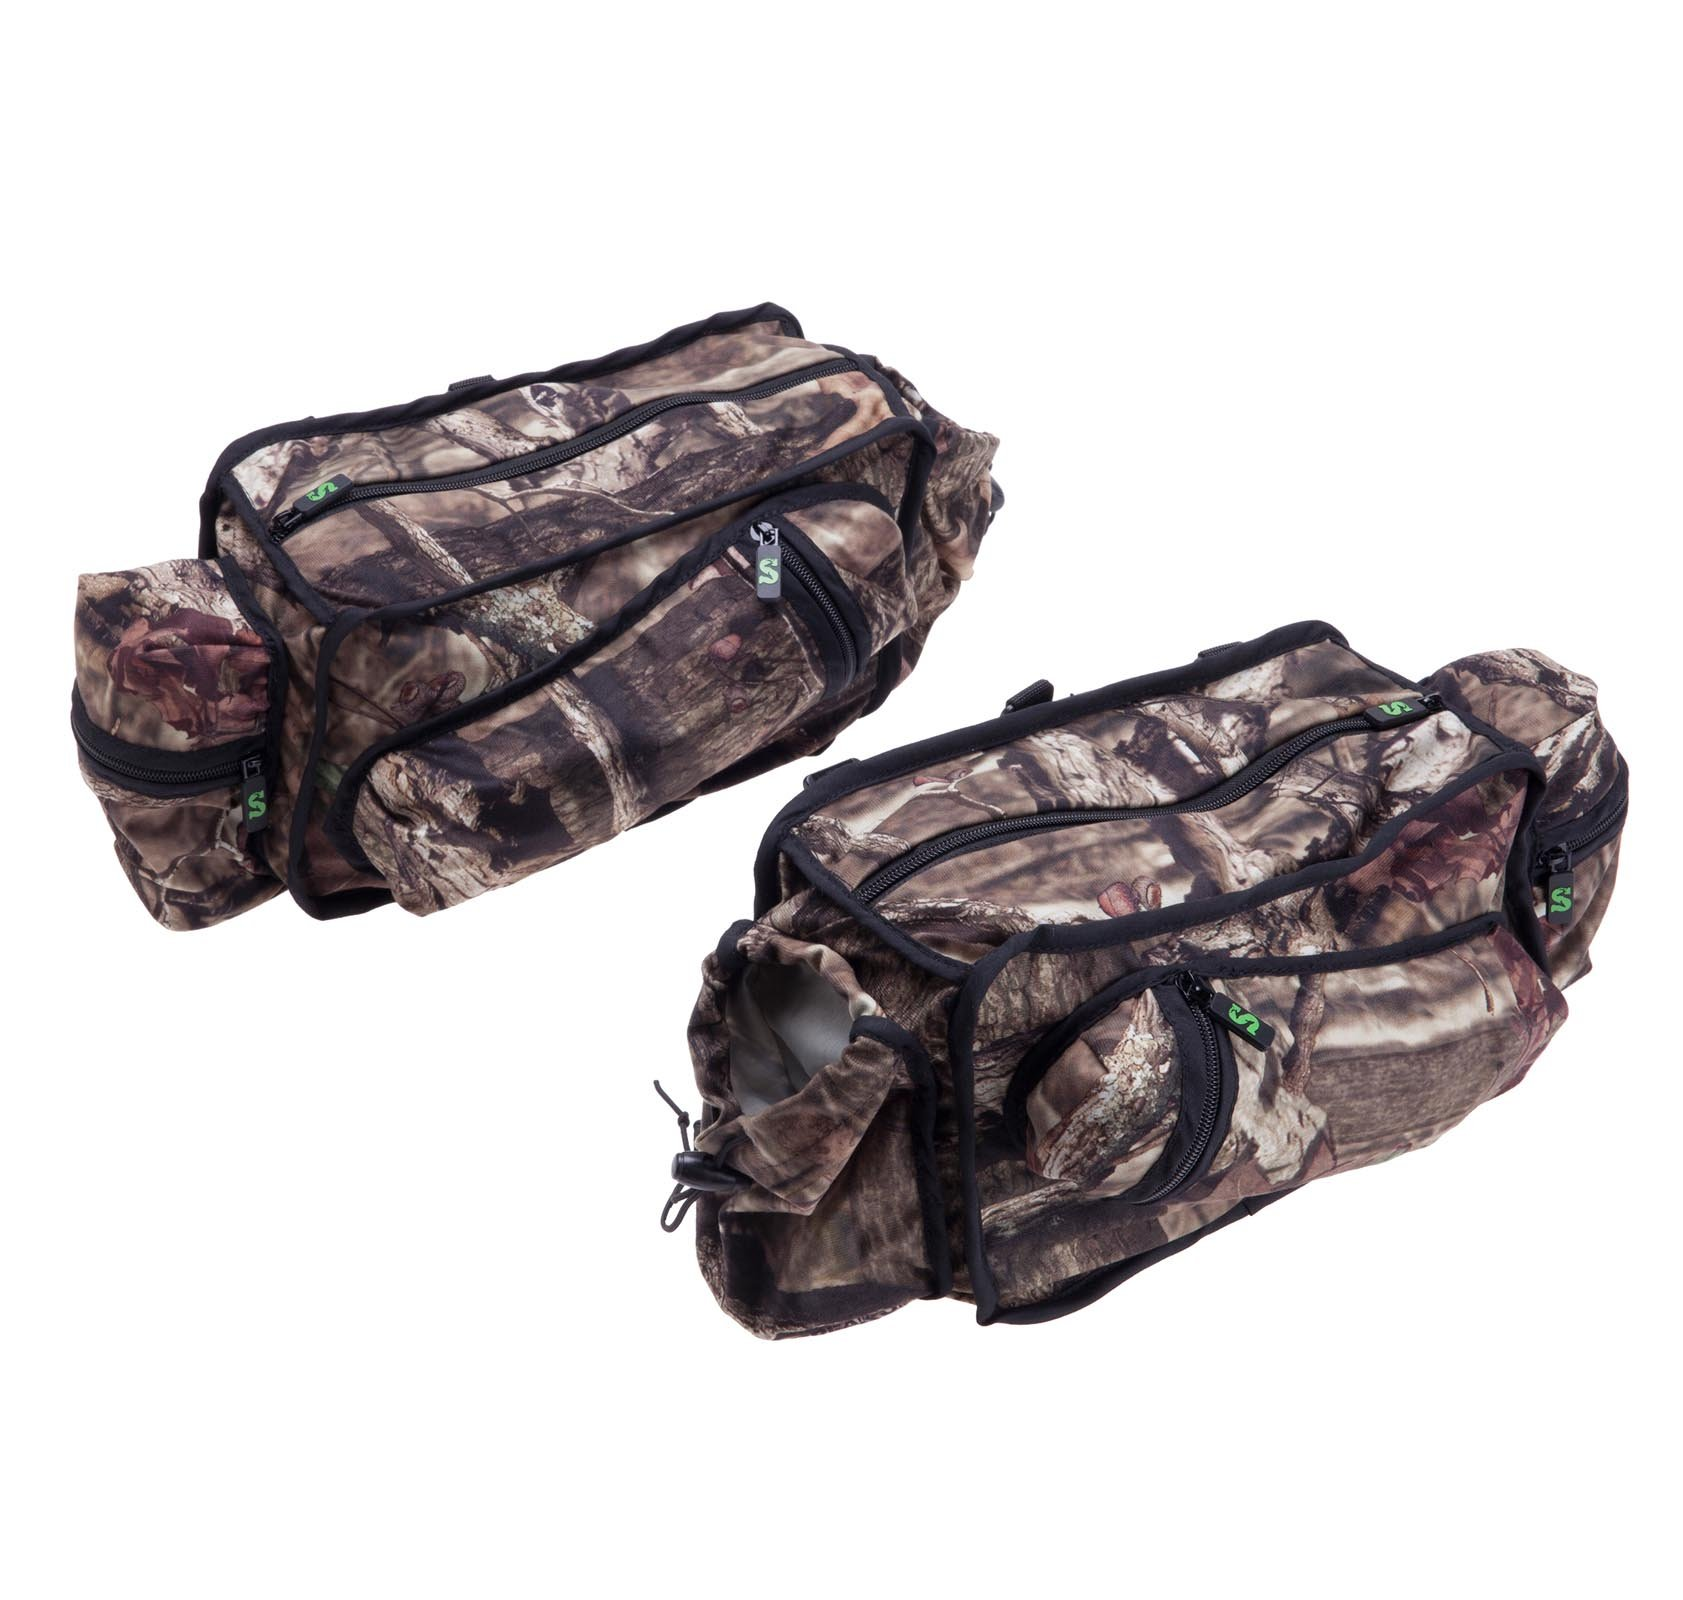 Summit Treestands Side Storage Bag, Mossy Oak Camo